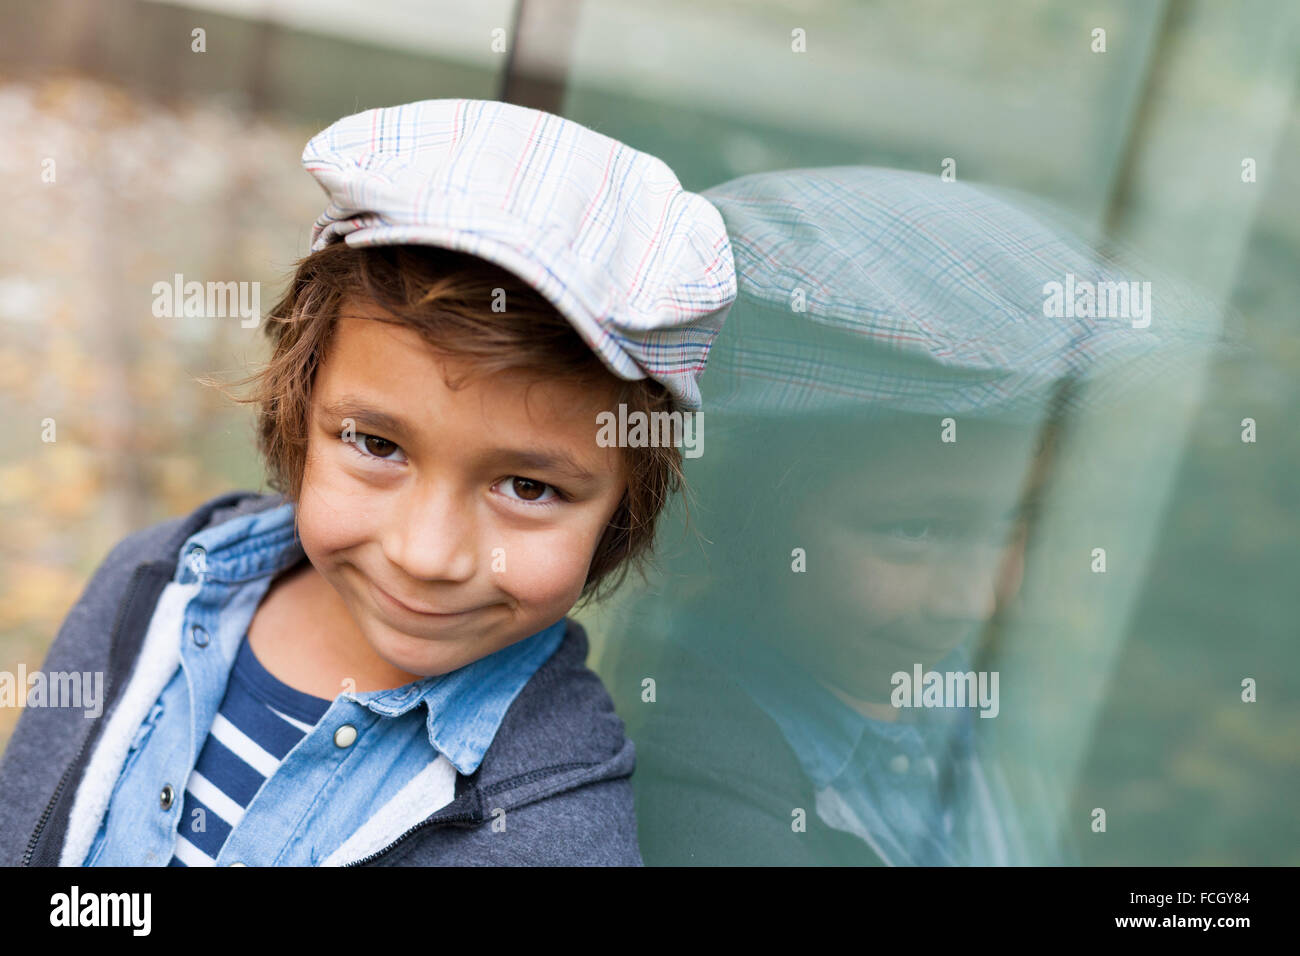 Porträt der lächelnde Knabe mit Mütze Stockfoto